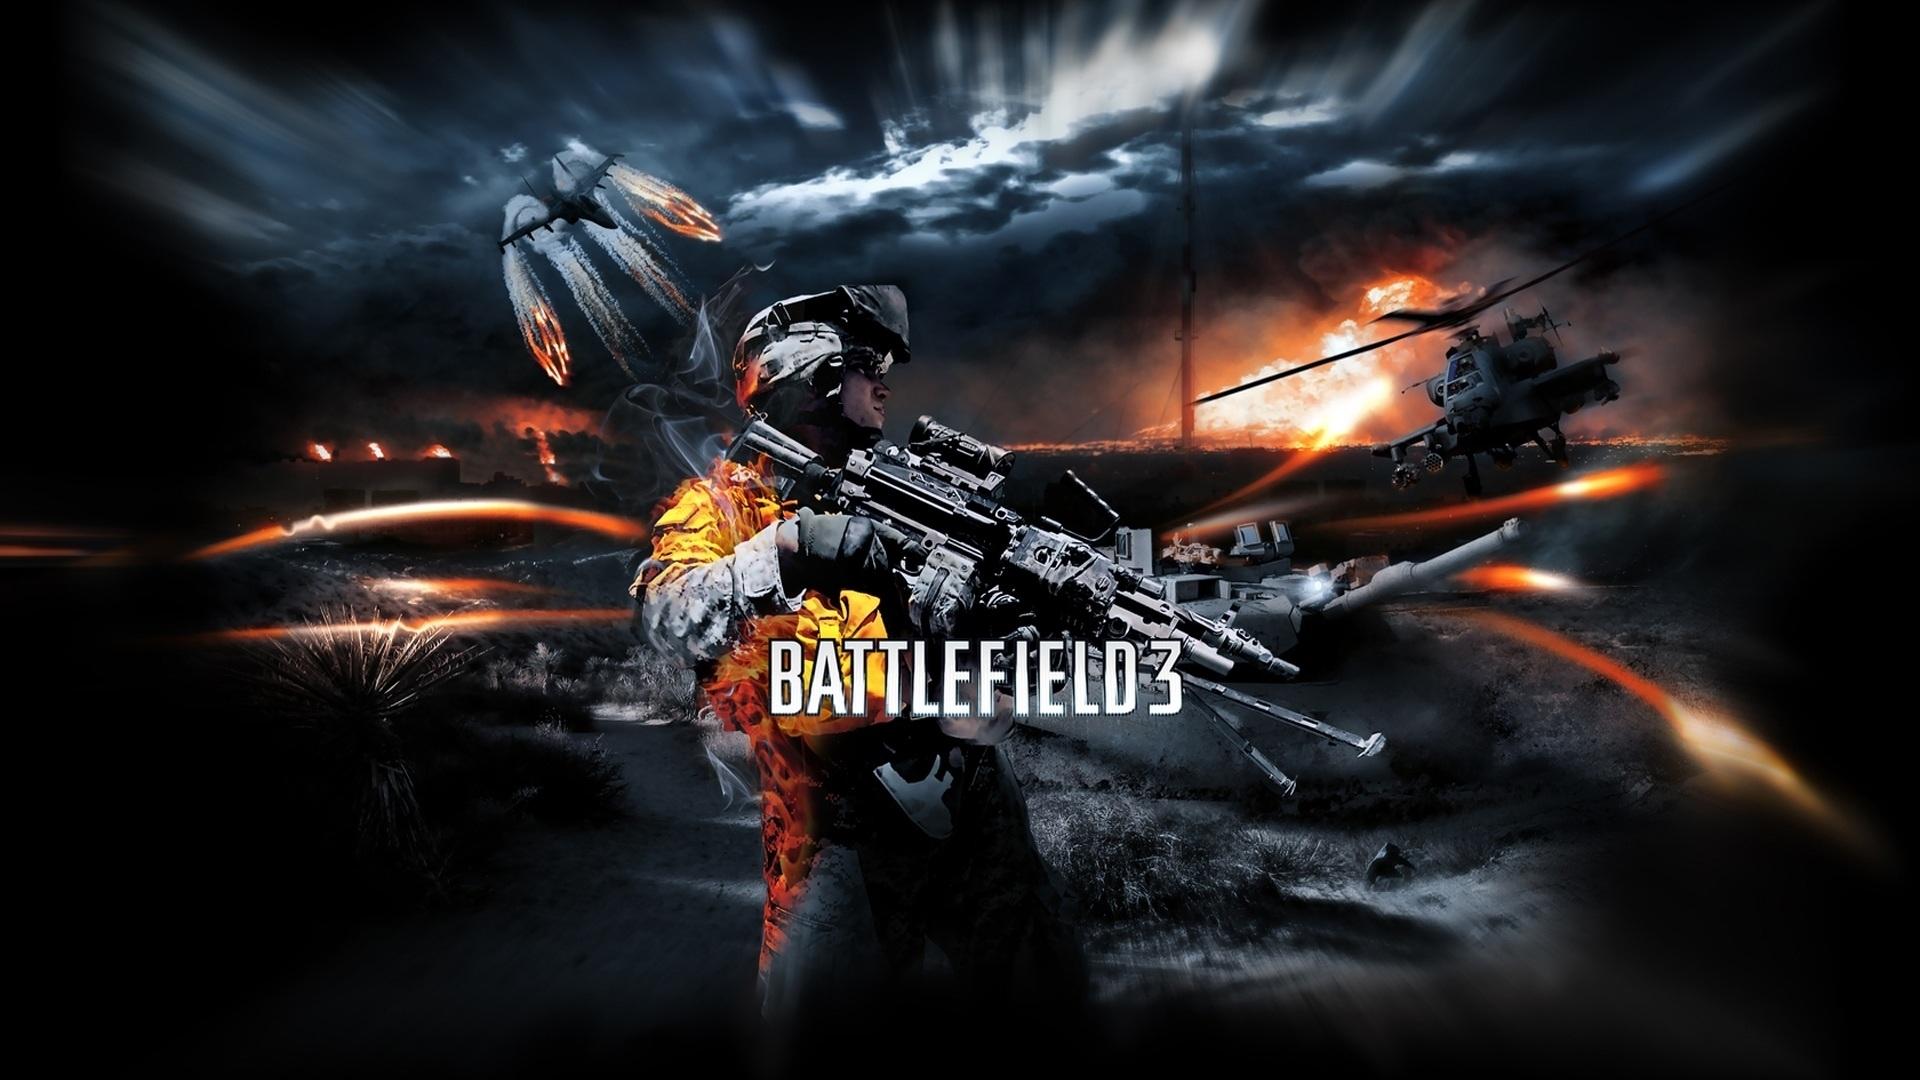 battlefield 3 hd wallpaper 1920x1080